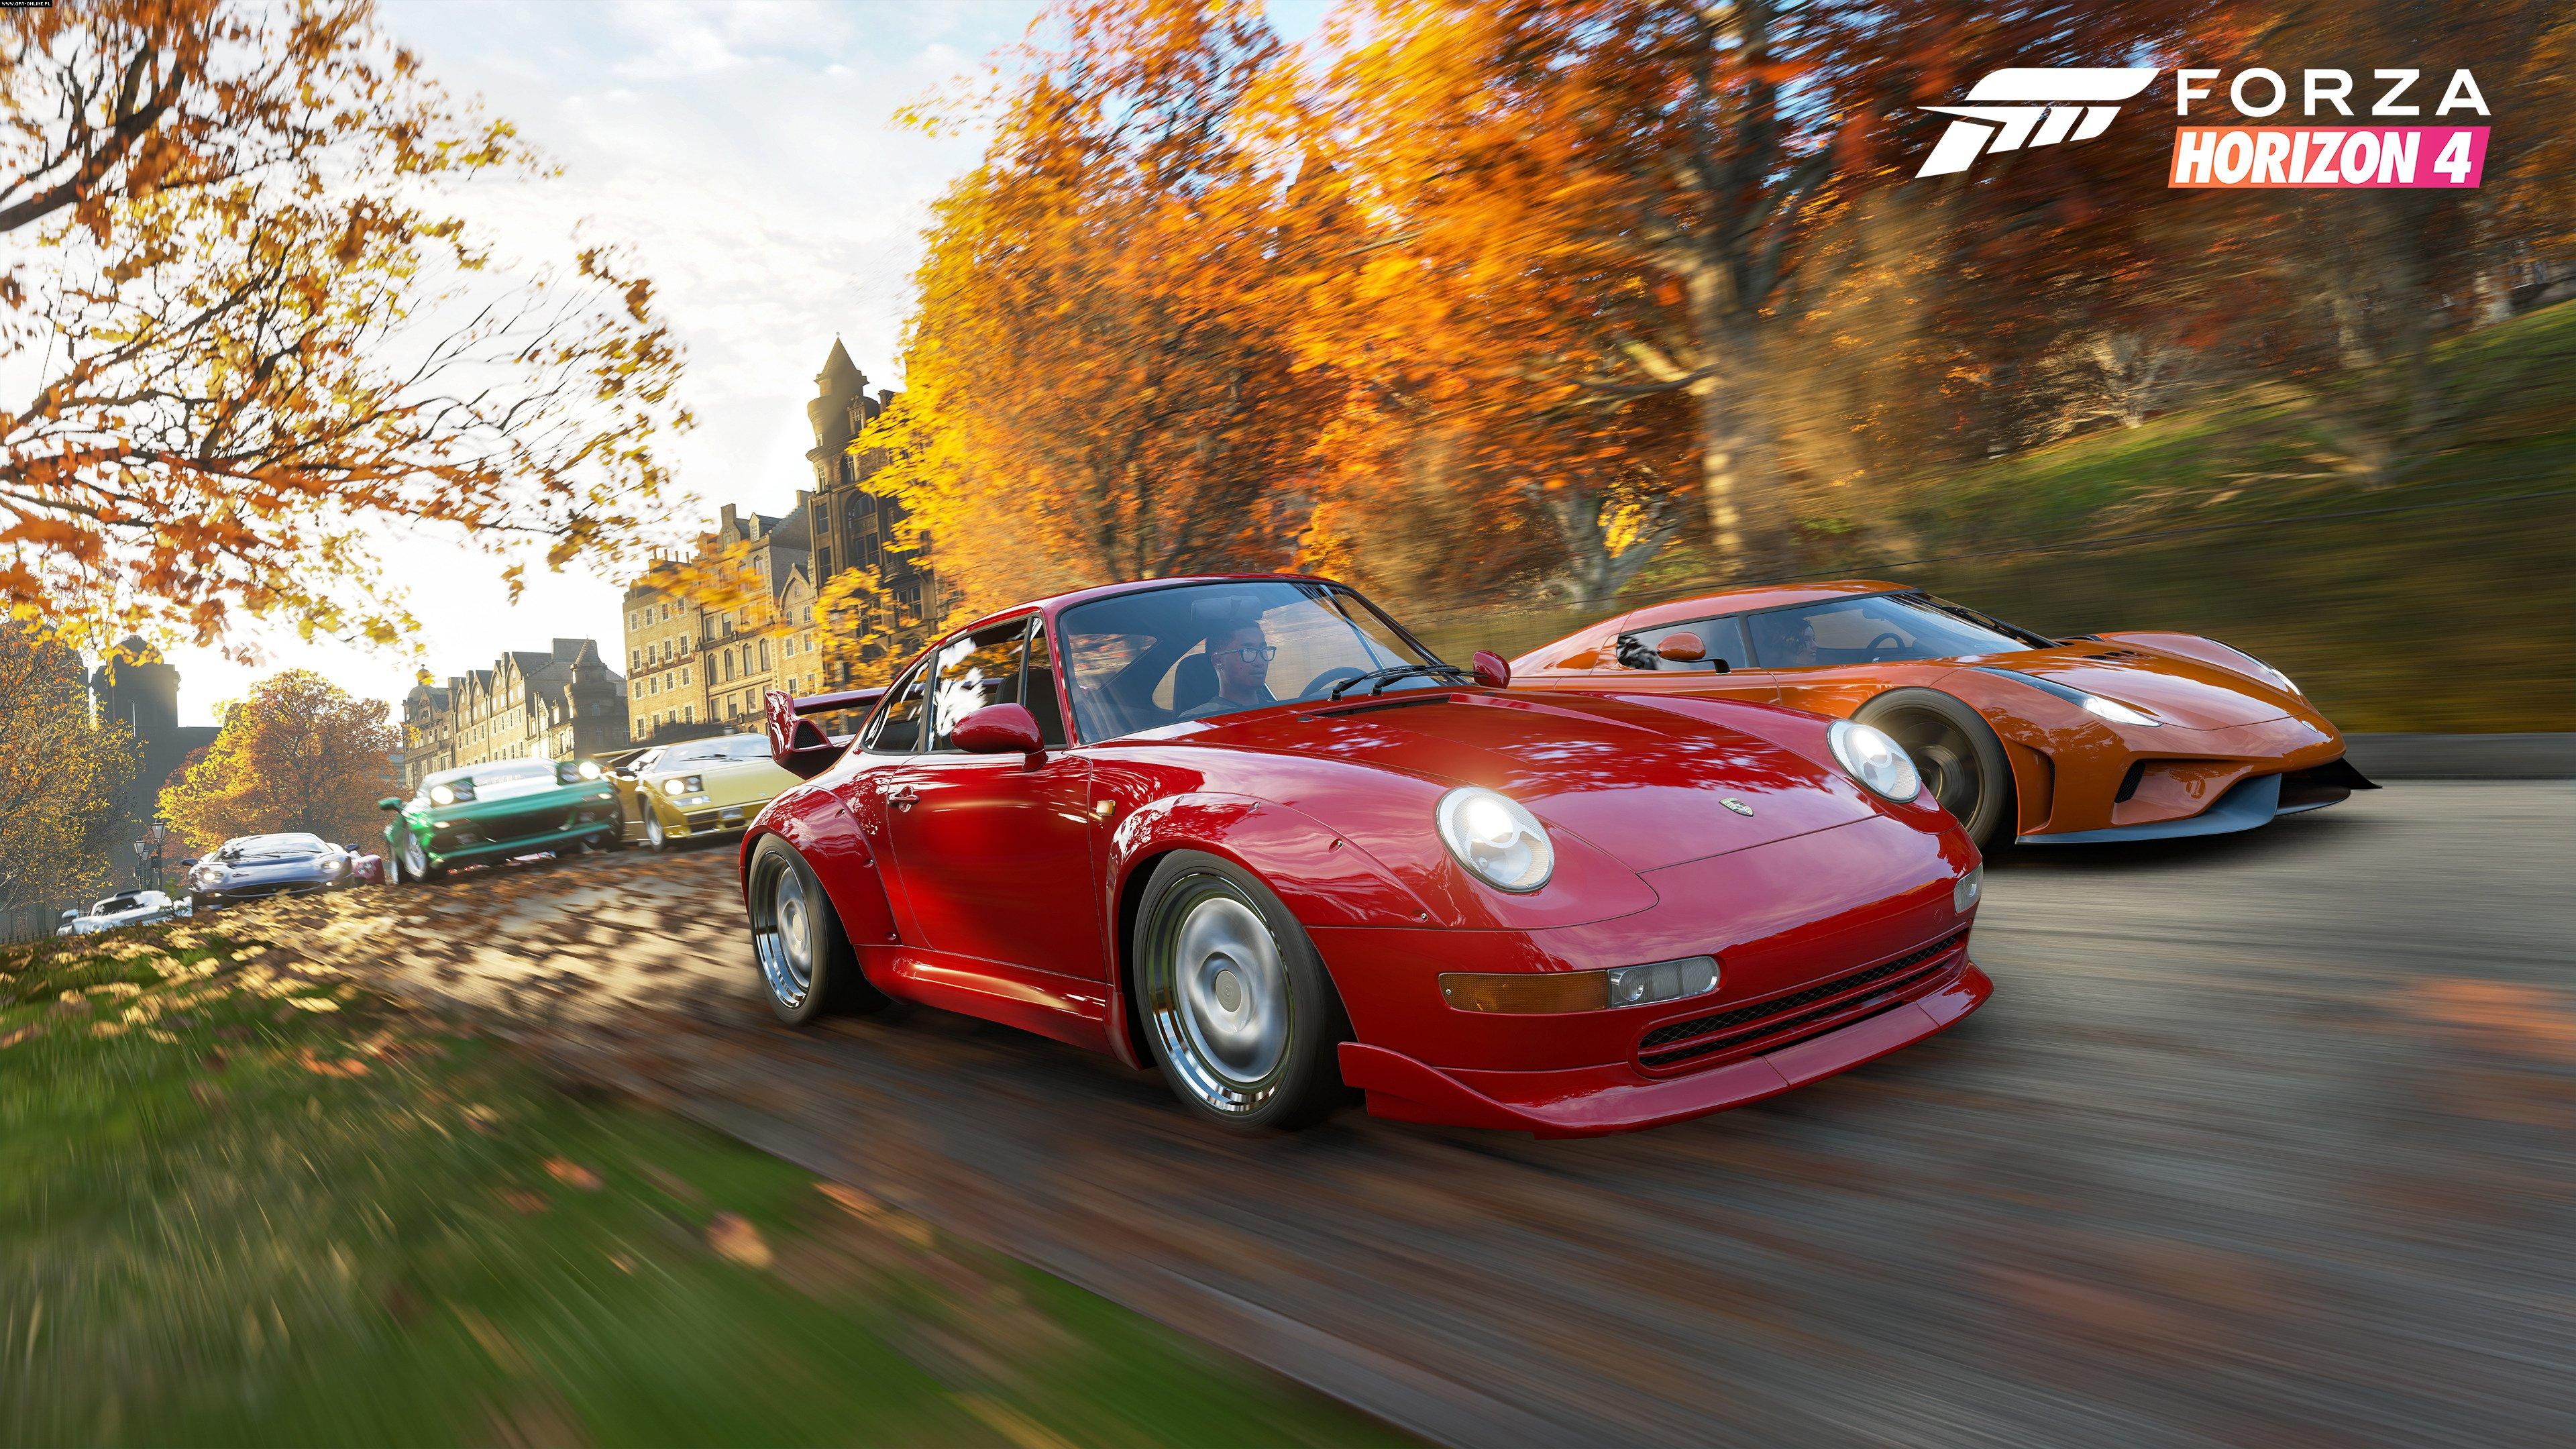 Forza Horizon 4 PC, XONE Games Image 9/14, Playground Games, Microsoft Studios